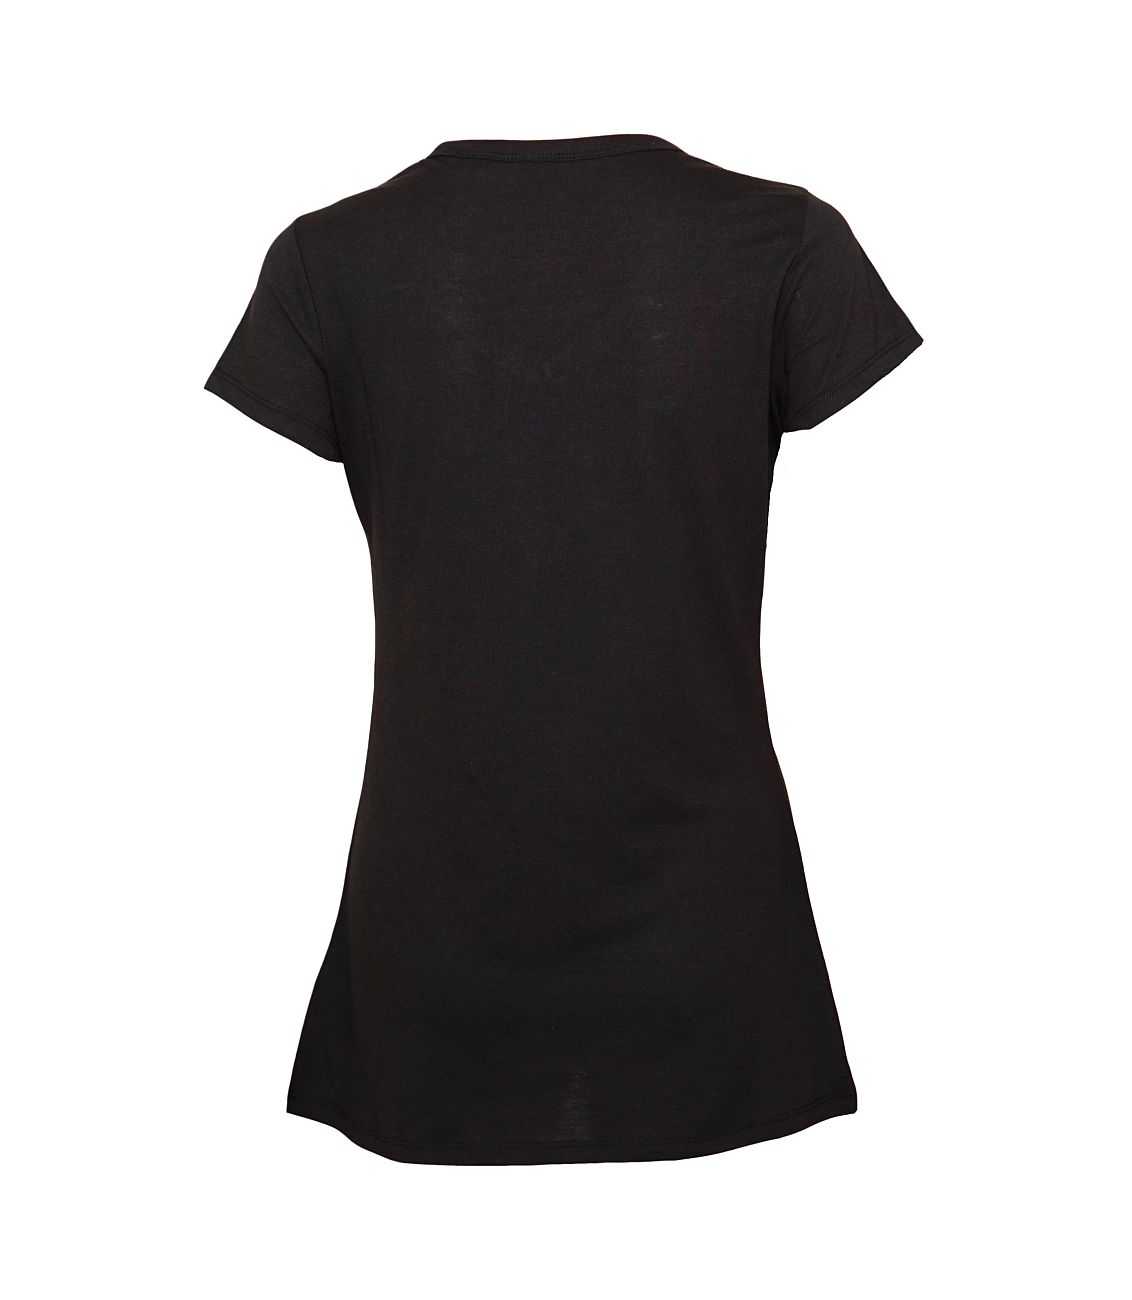 G-Star RAW Damen Shirt T-Shirt Eyben slim D04434 2757 990 Black F18-GSD1